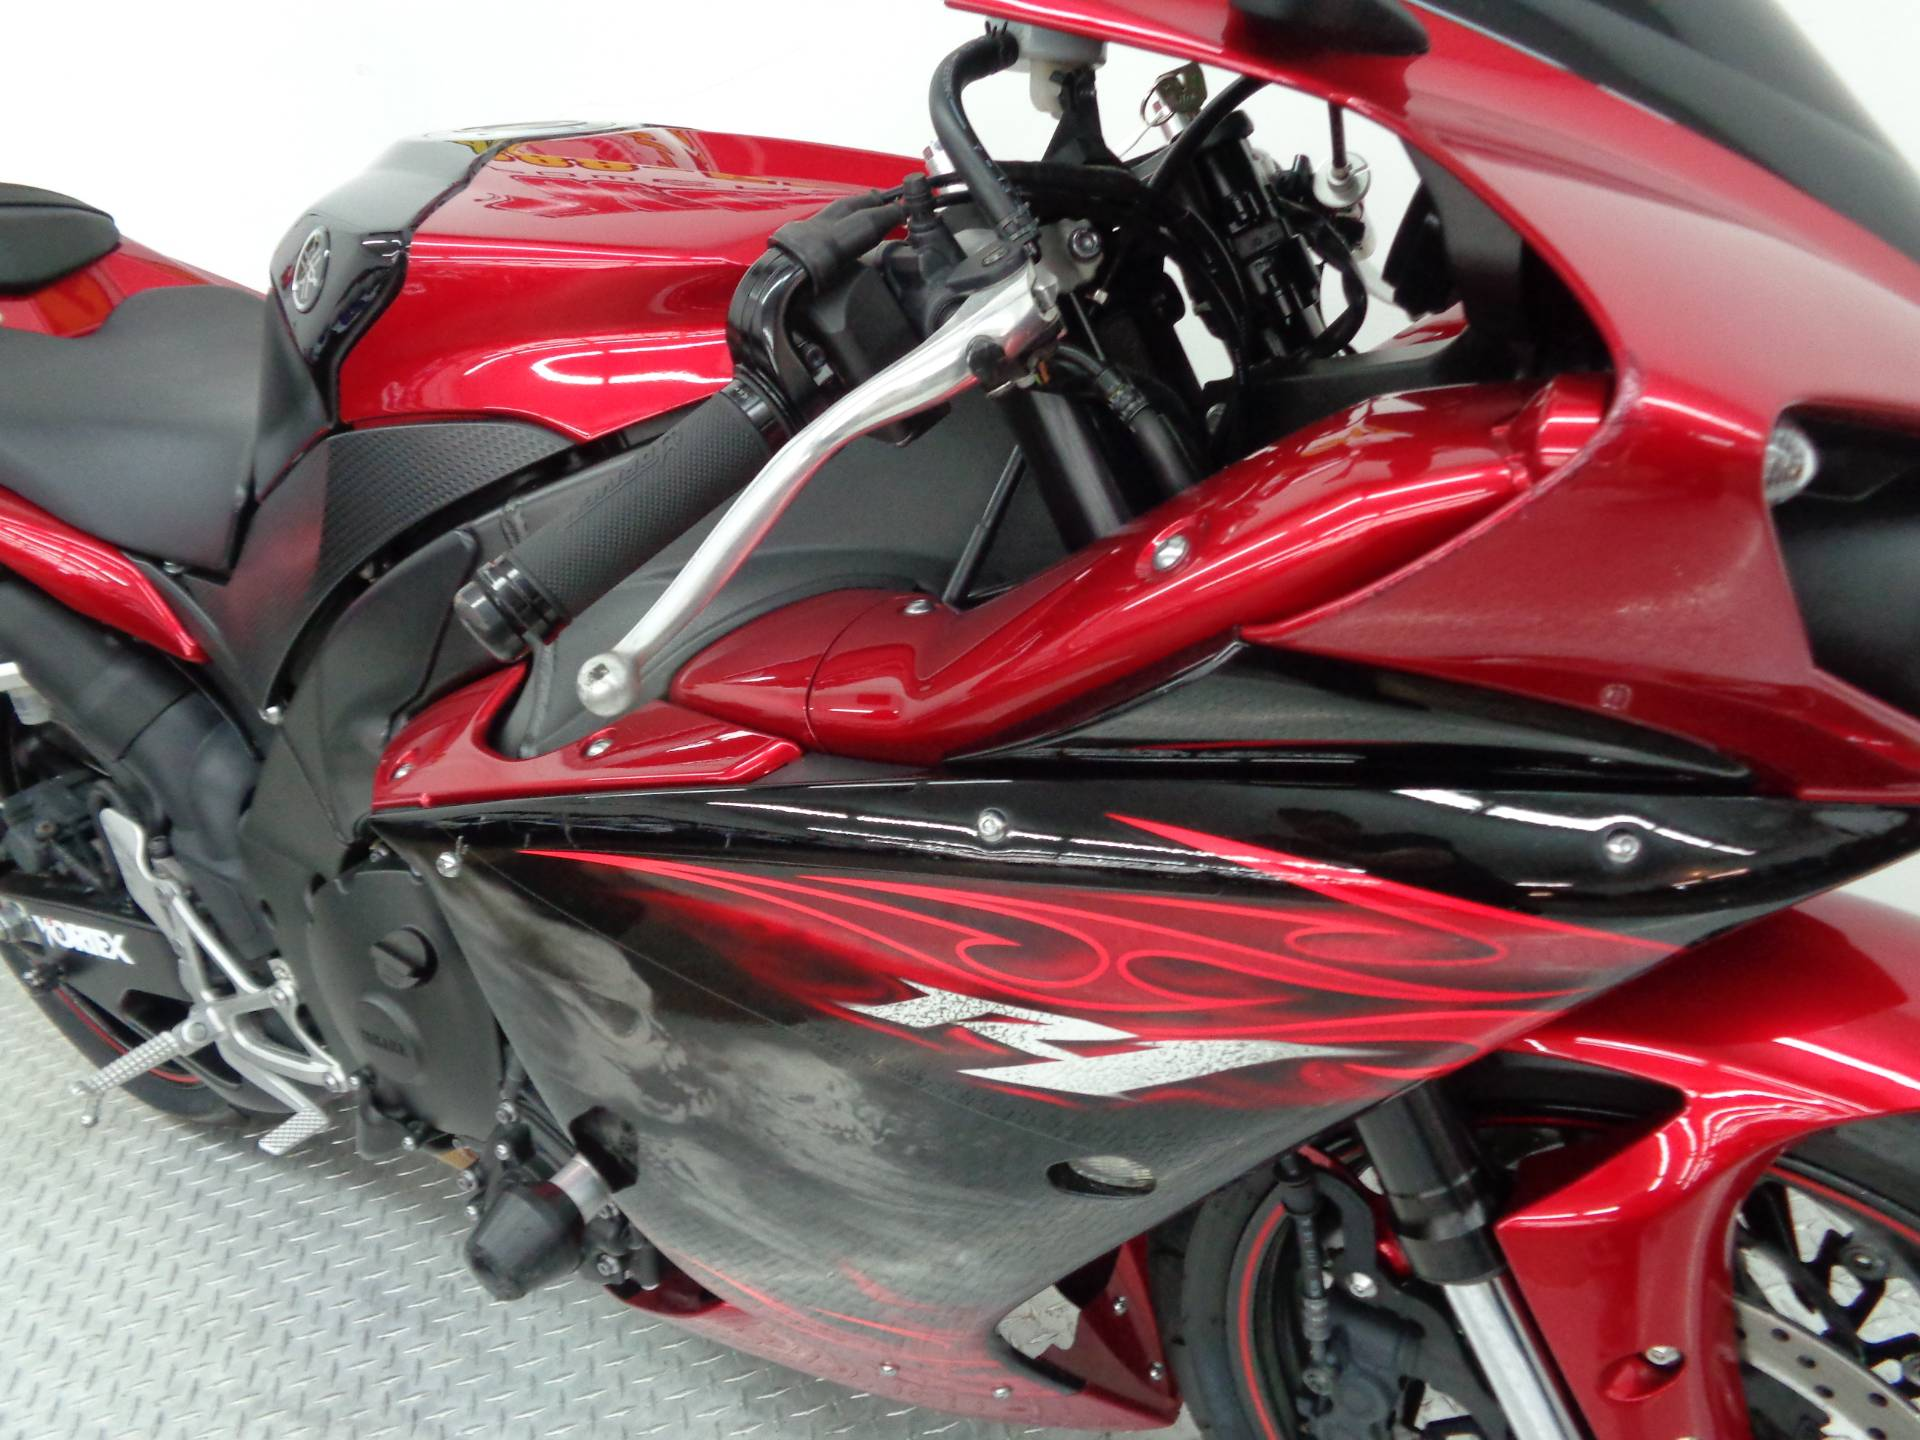 2011 Yamaha YZF-R1 8